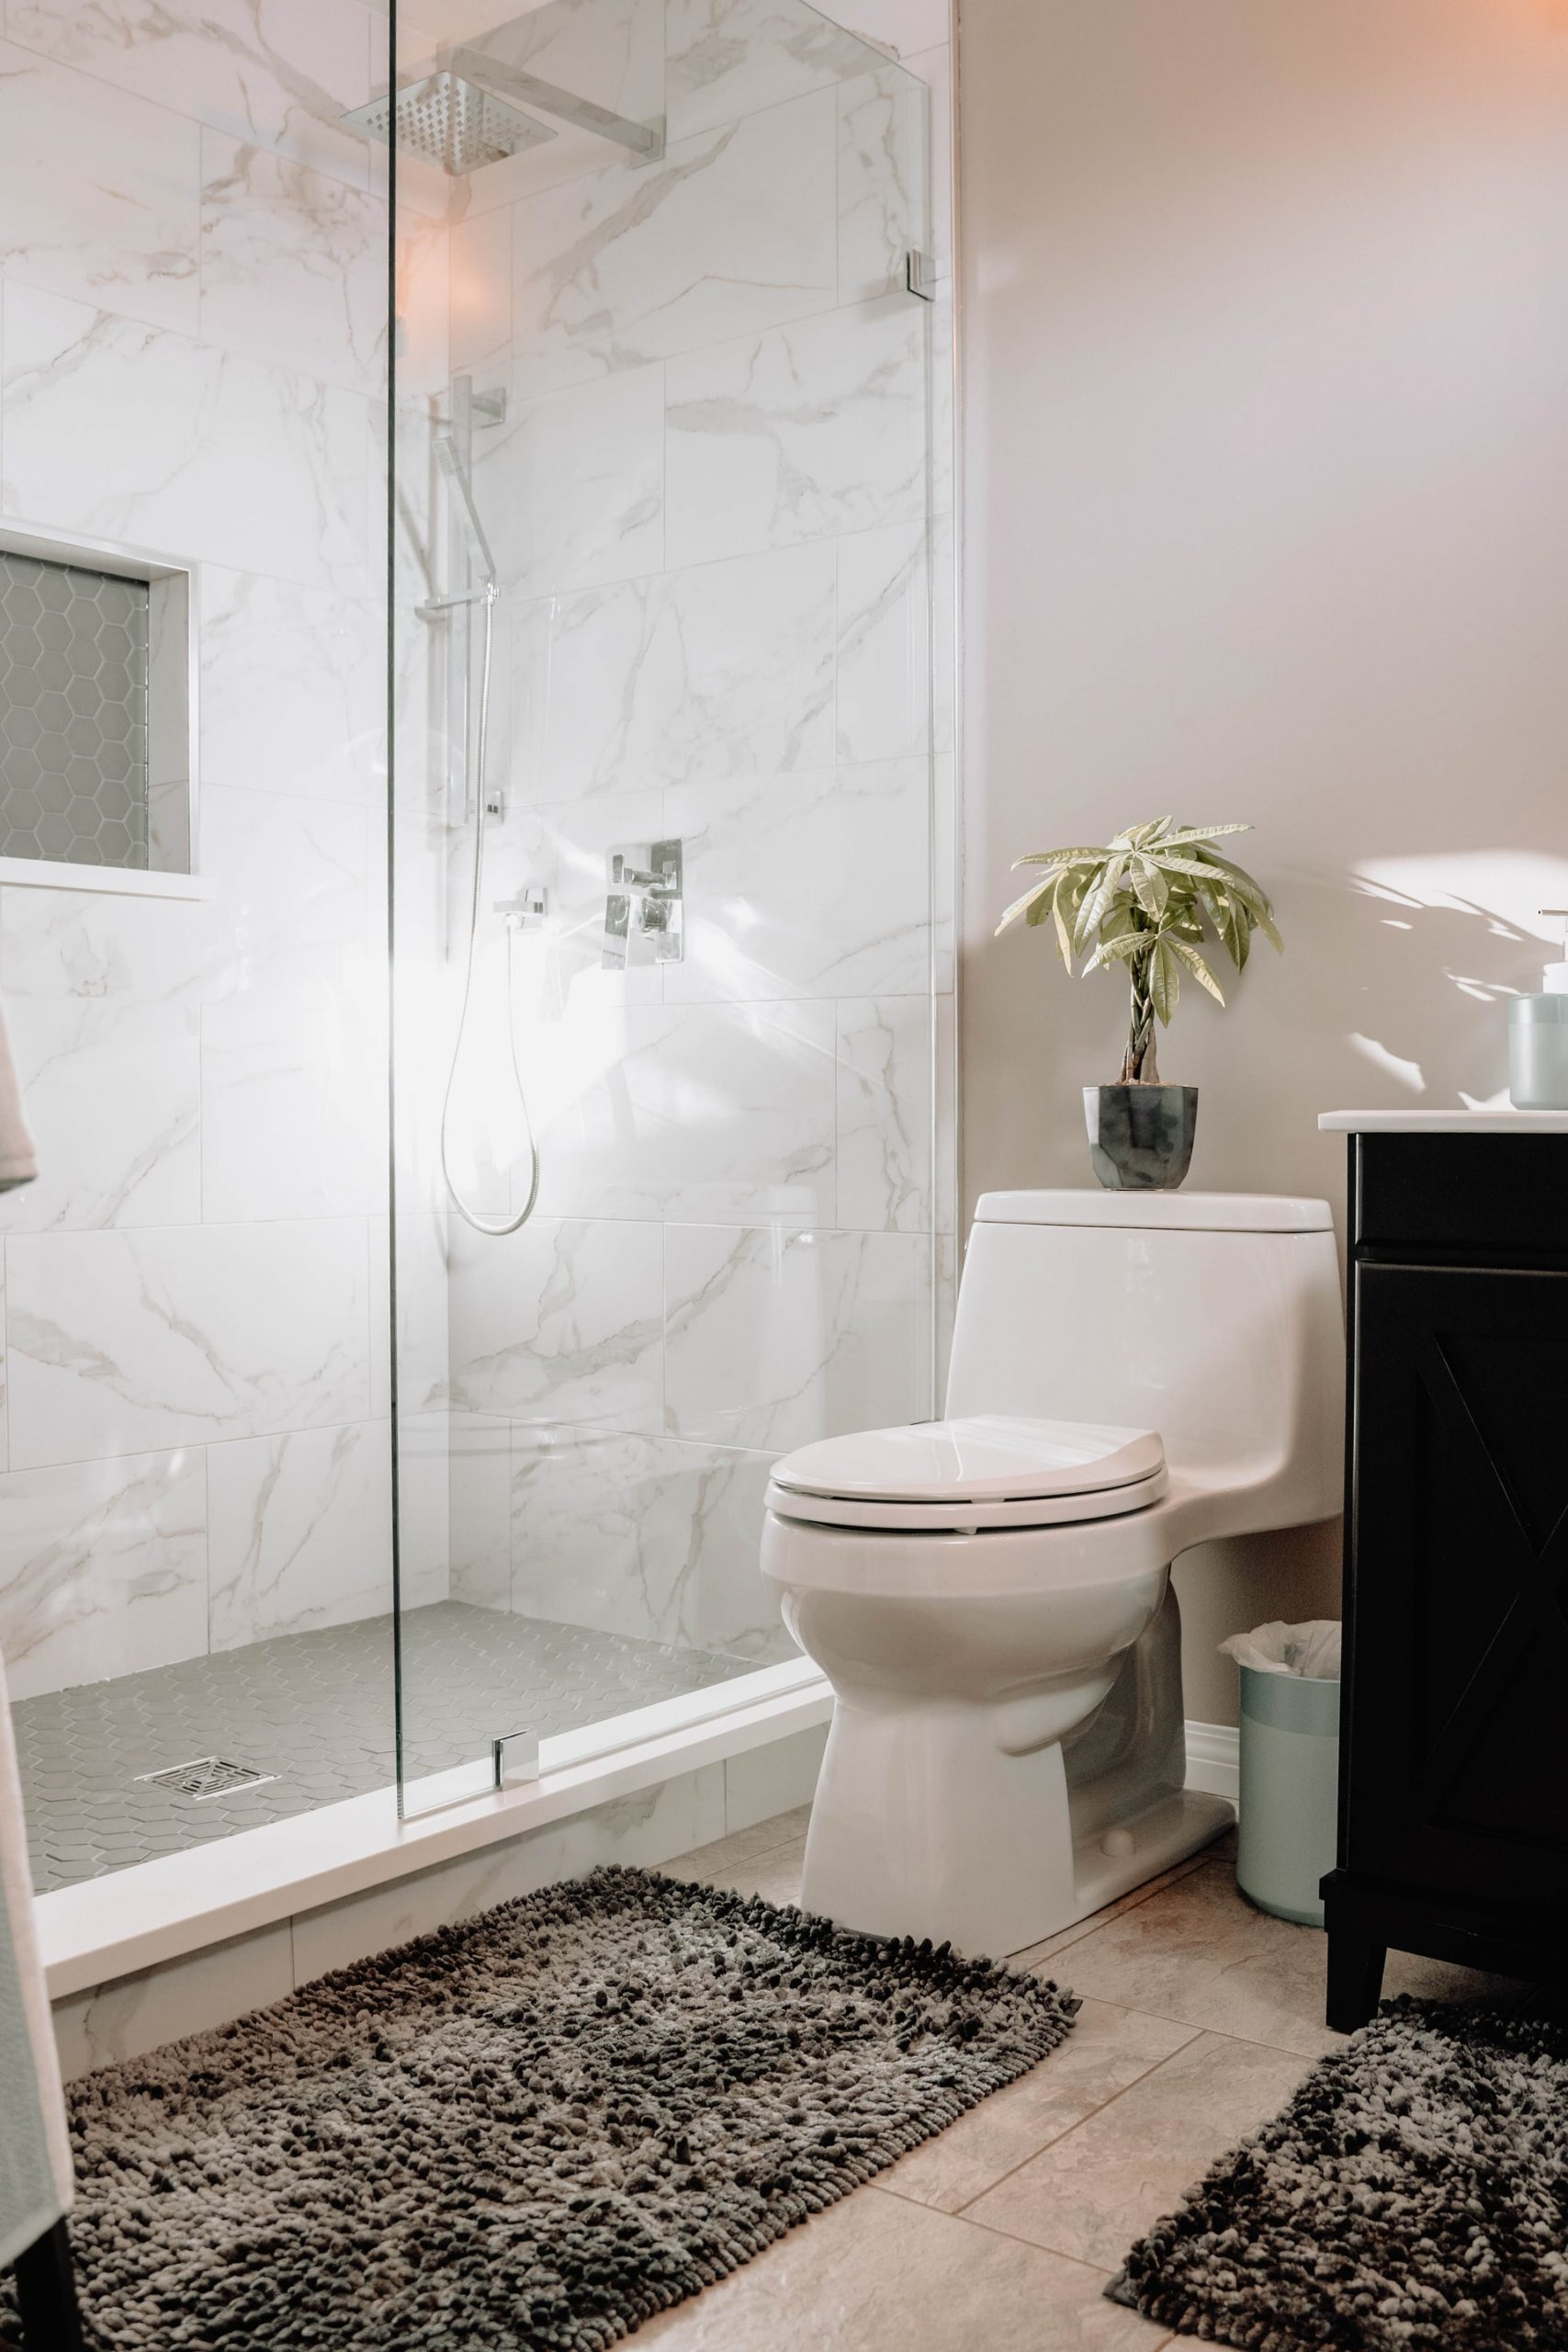 Easy Ways to Enjoy Coziness in The Bathroom